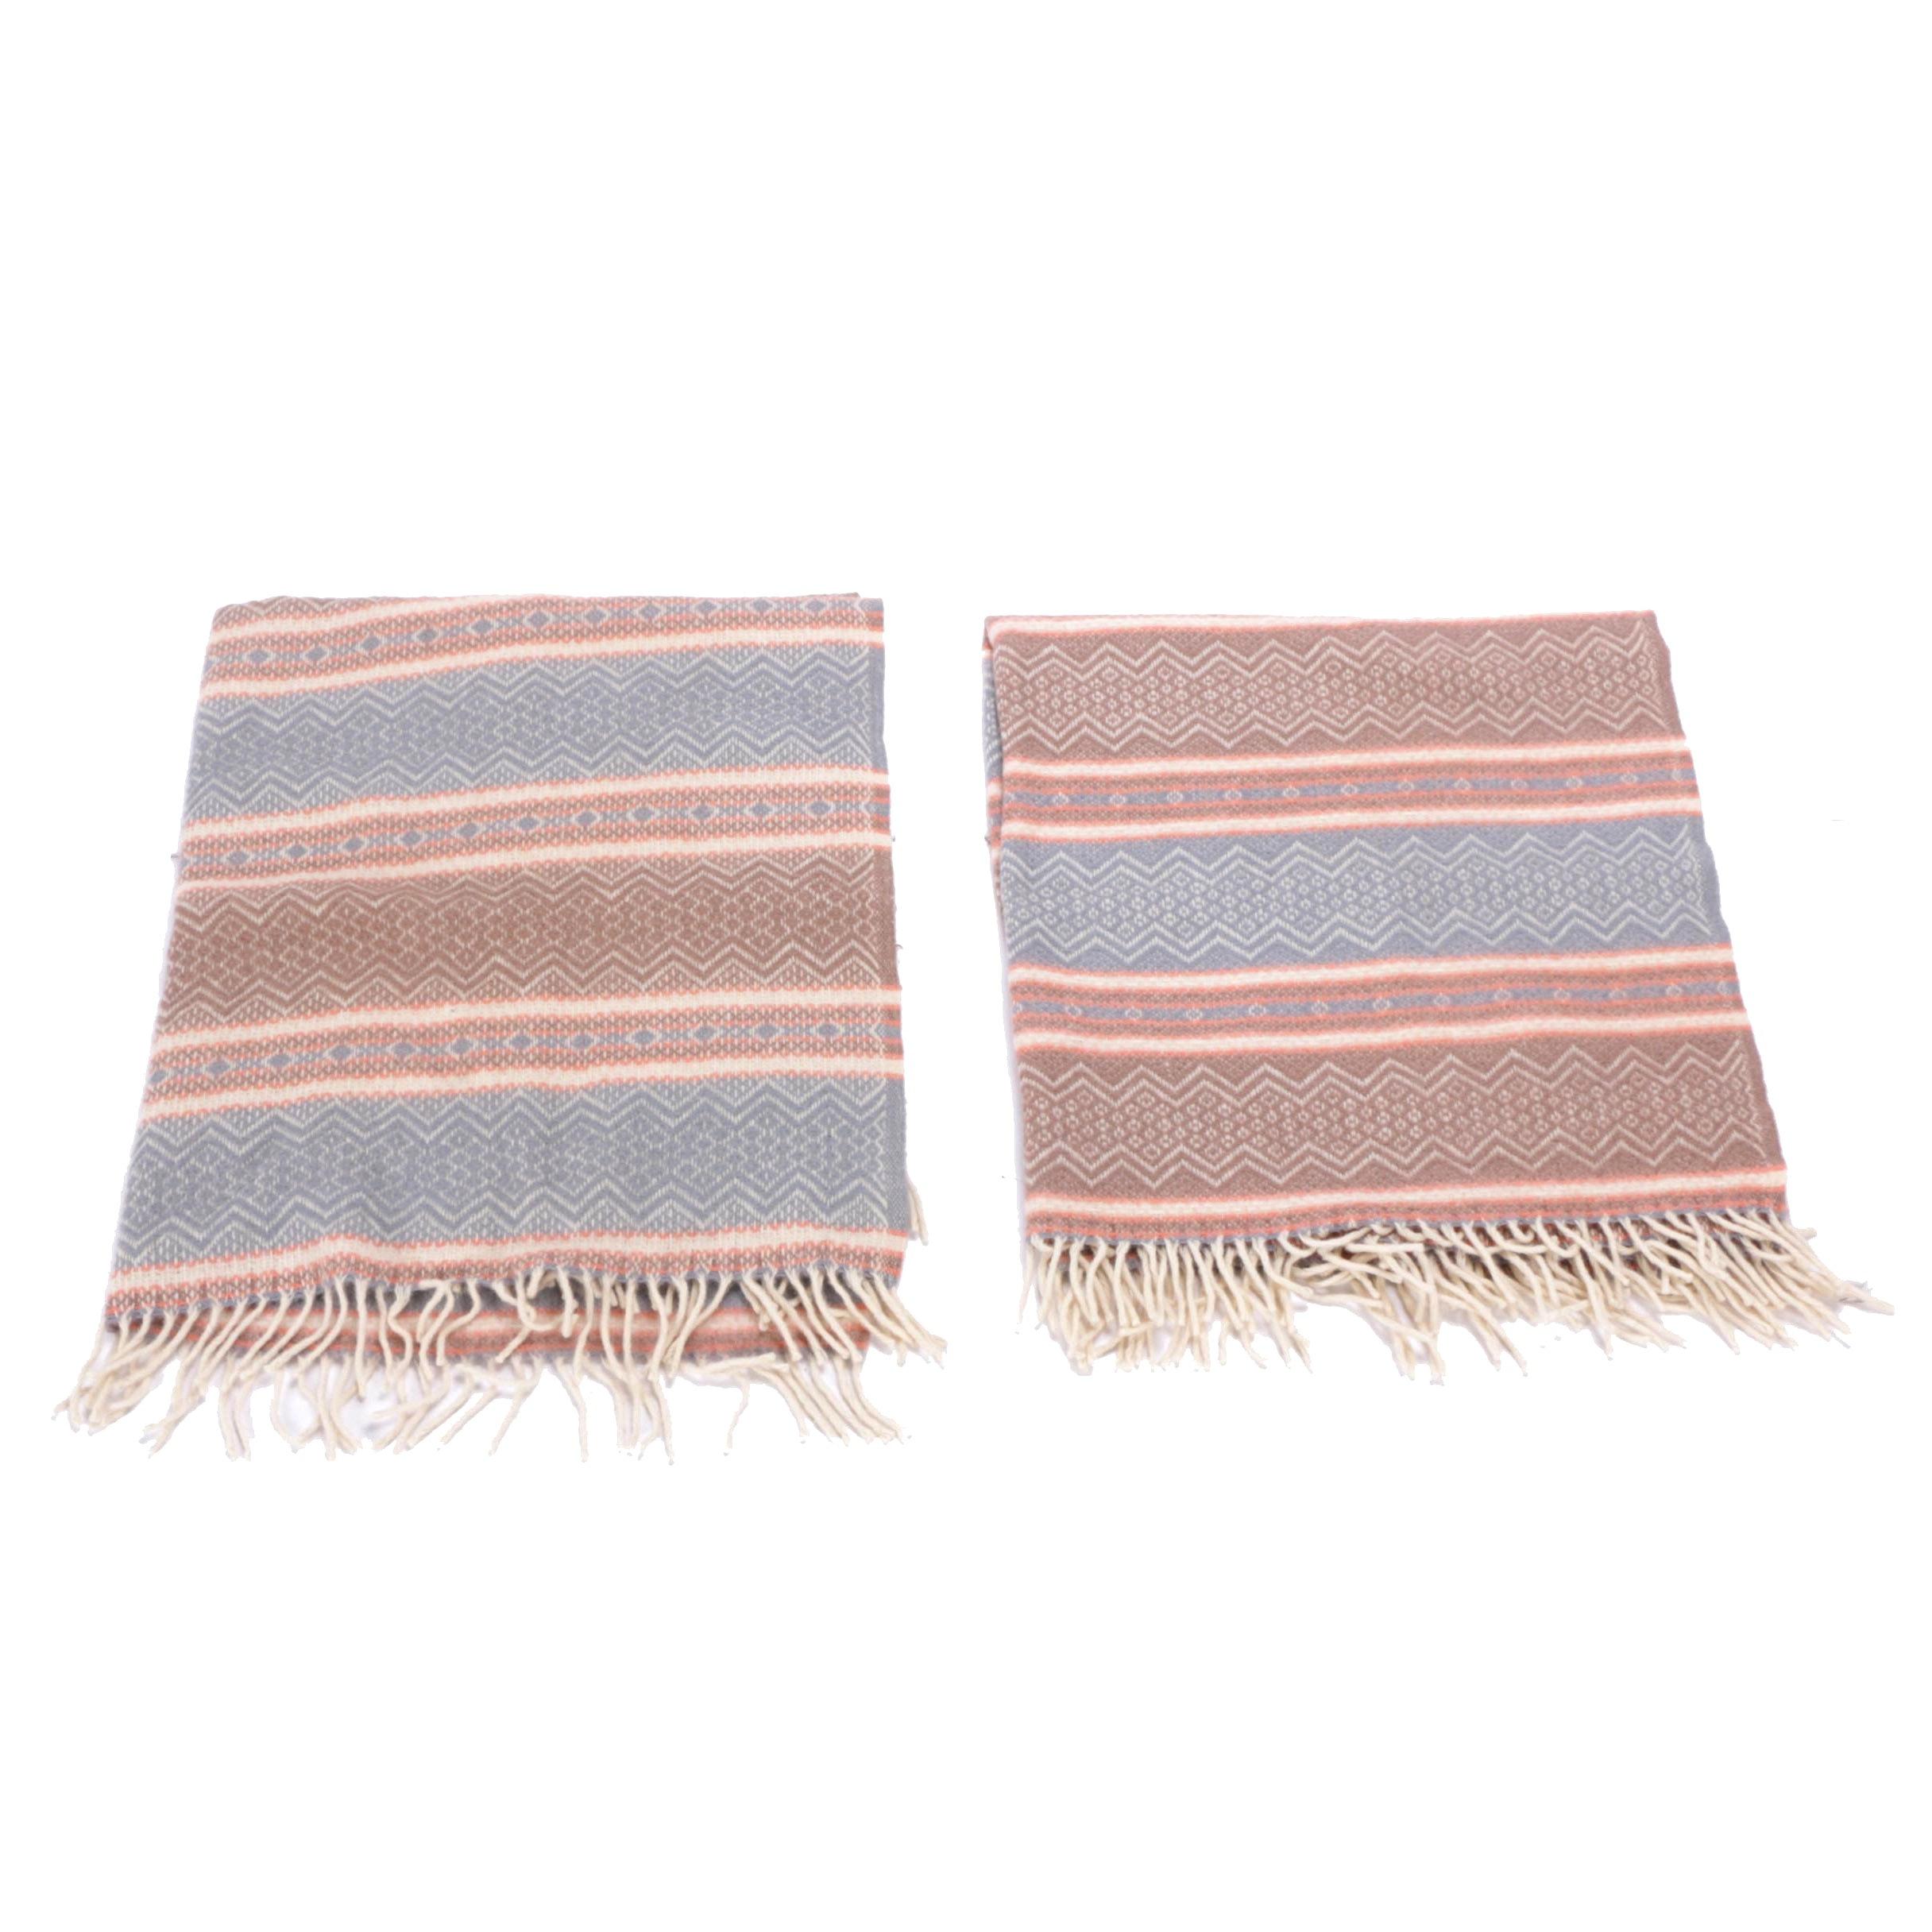 "Faribo ""Scandia"" Wool Blankets"